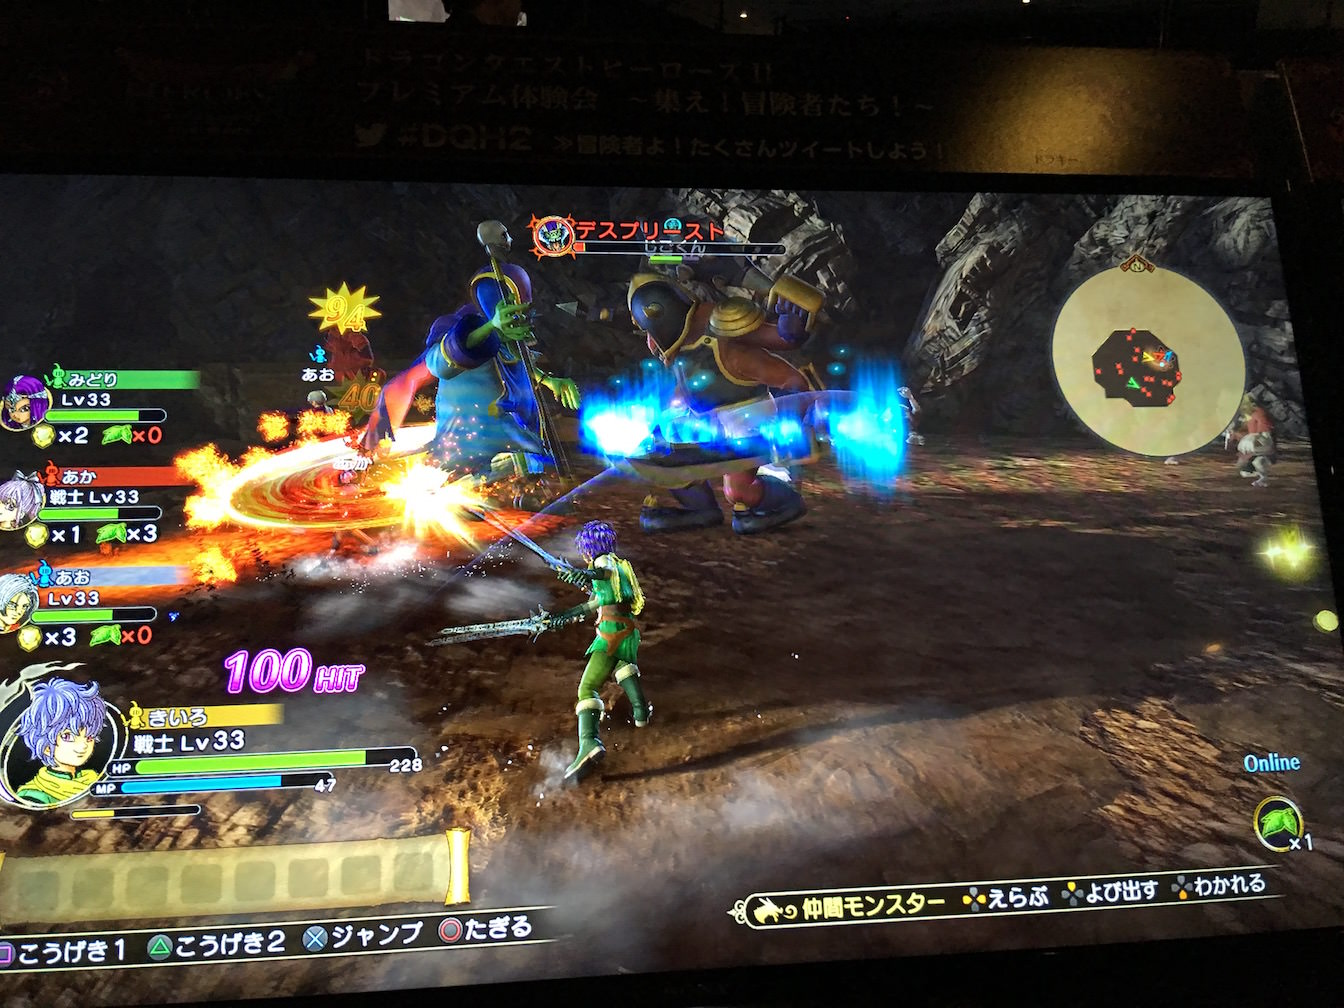 Dragon quest heros 2 premium experience meeting report 34